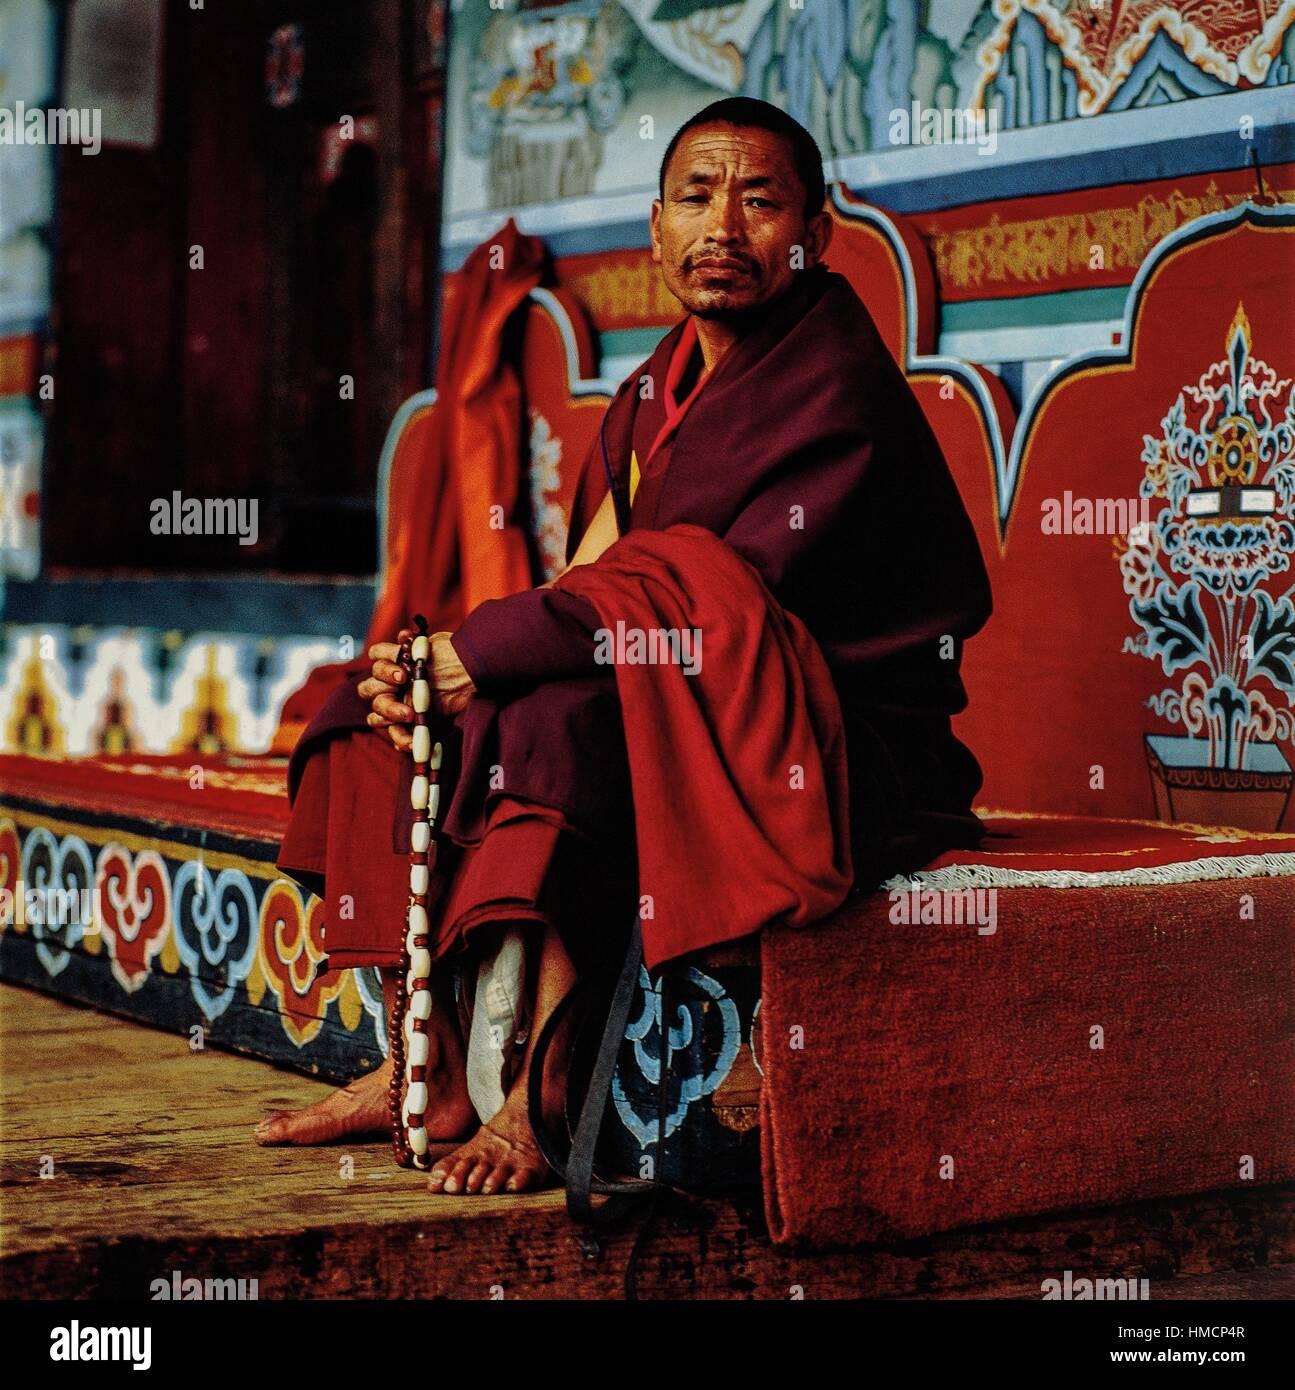 Lama praying in the Taktsang Palphug monastery, also known as Paro Taktsang or Tiger's nest, Bhutan. - Stock Image